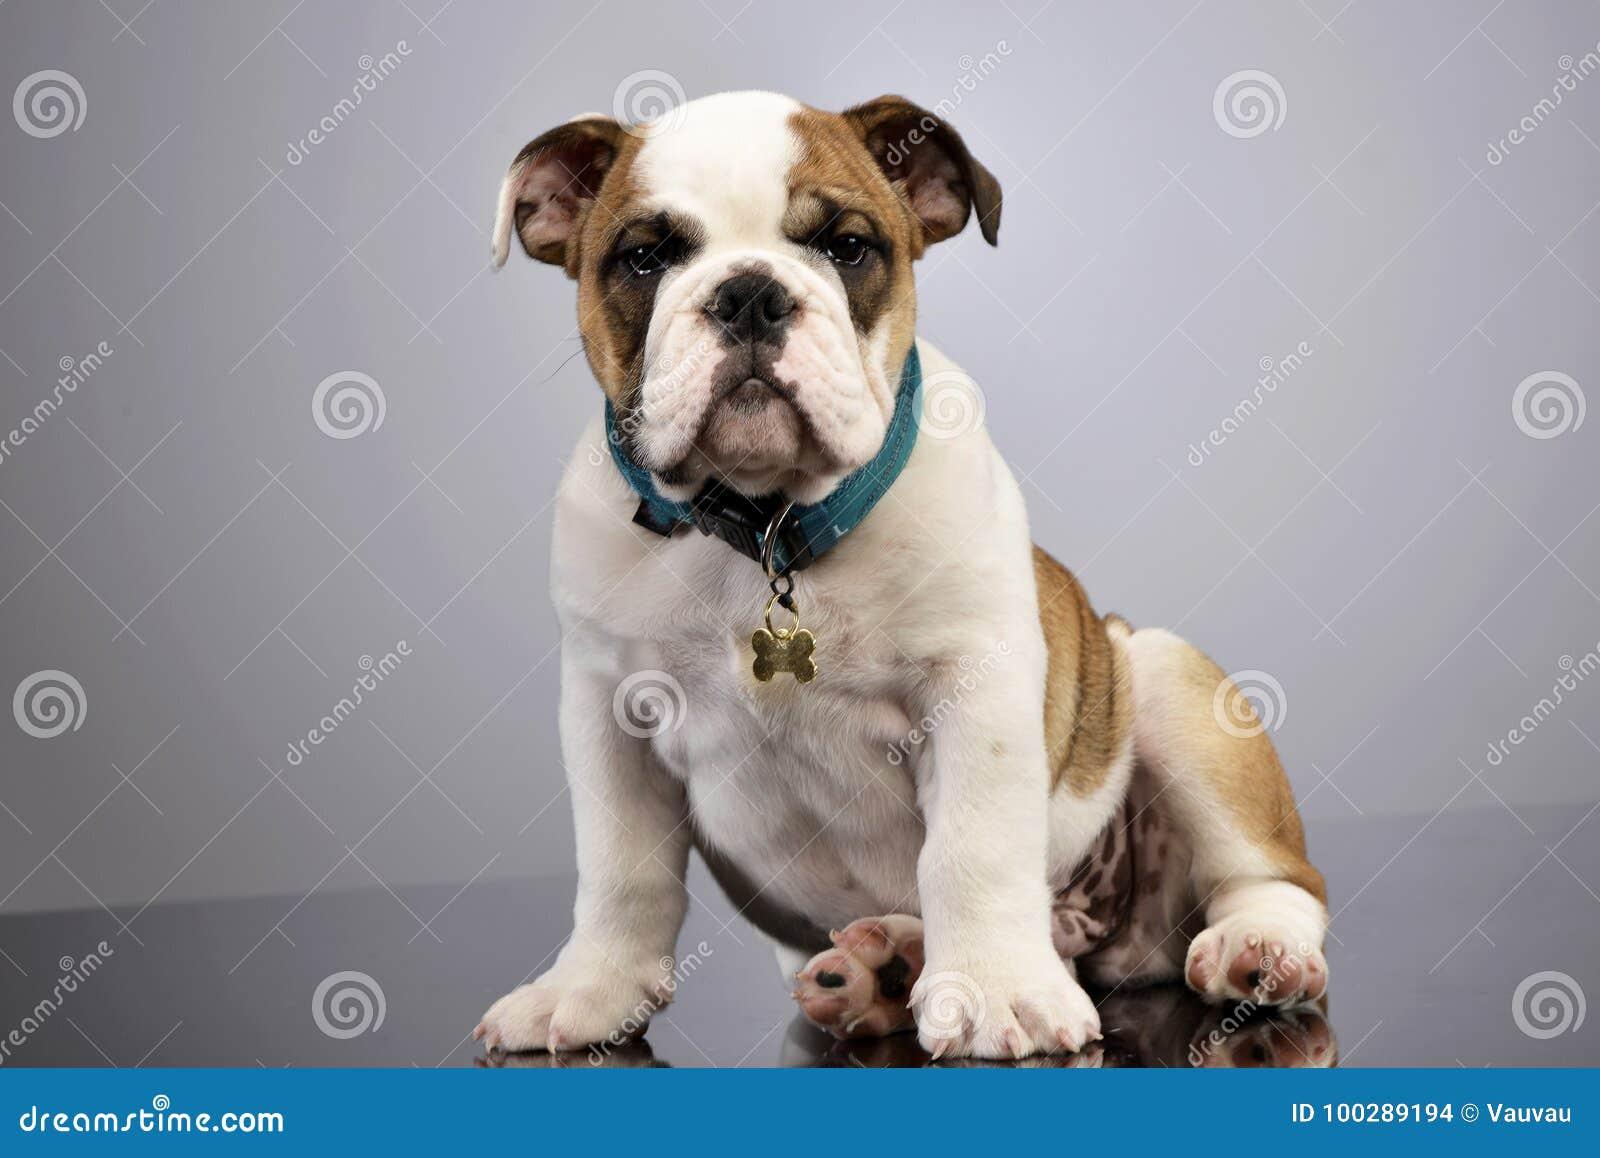 Studio Shot Of An Adorable English Bulldog Puppy Stock Photo Image Of Cute Collar 100289194